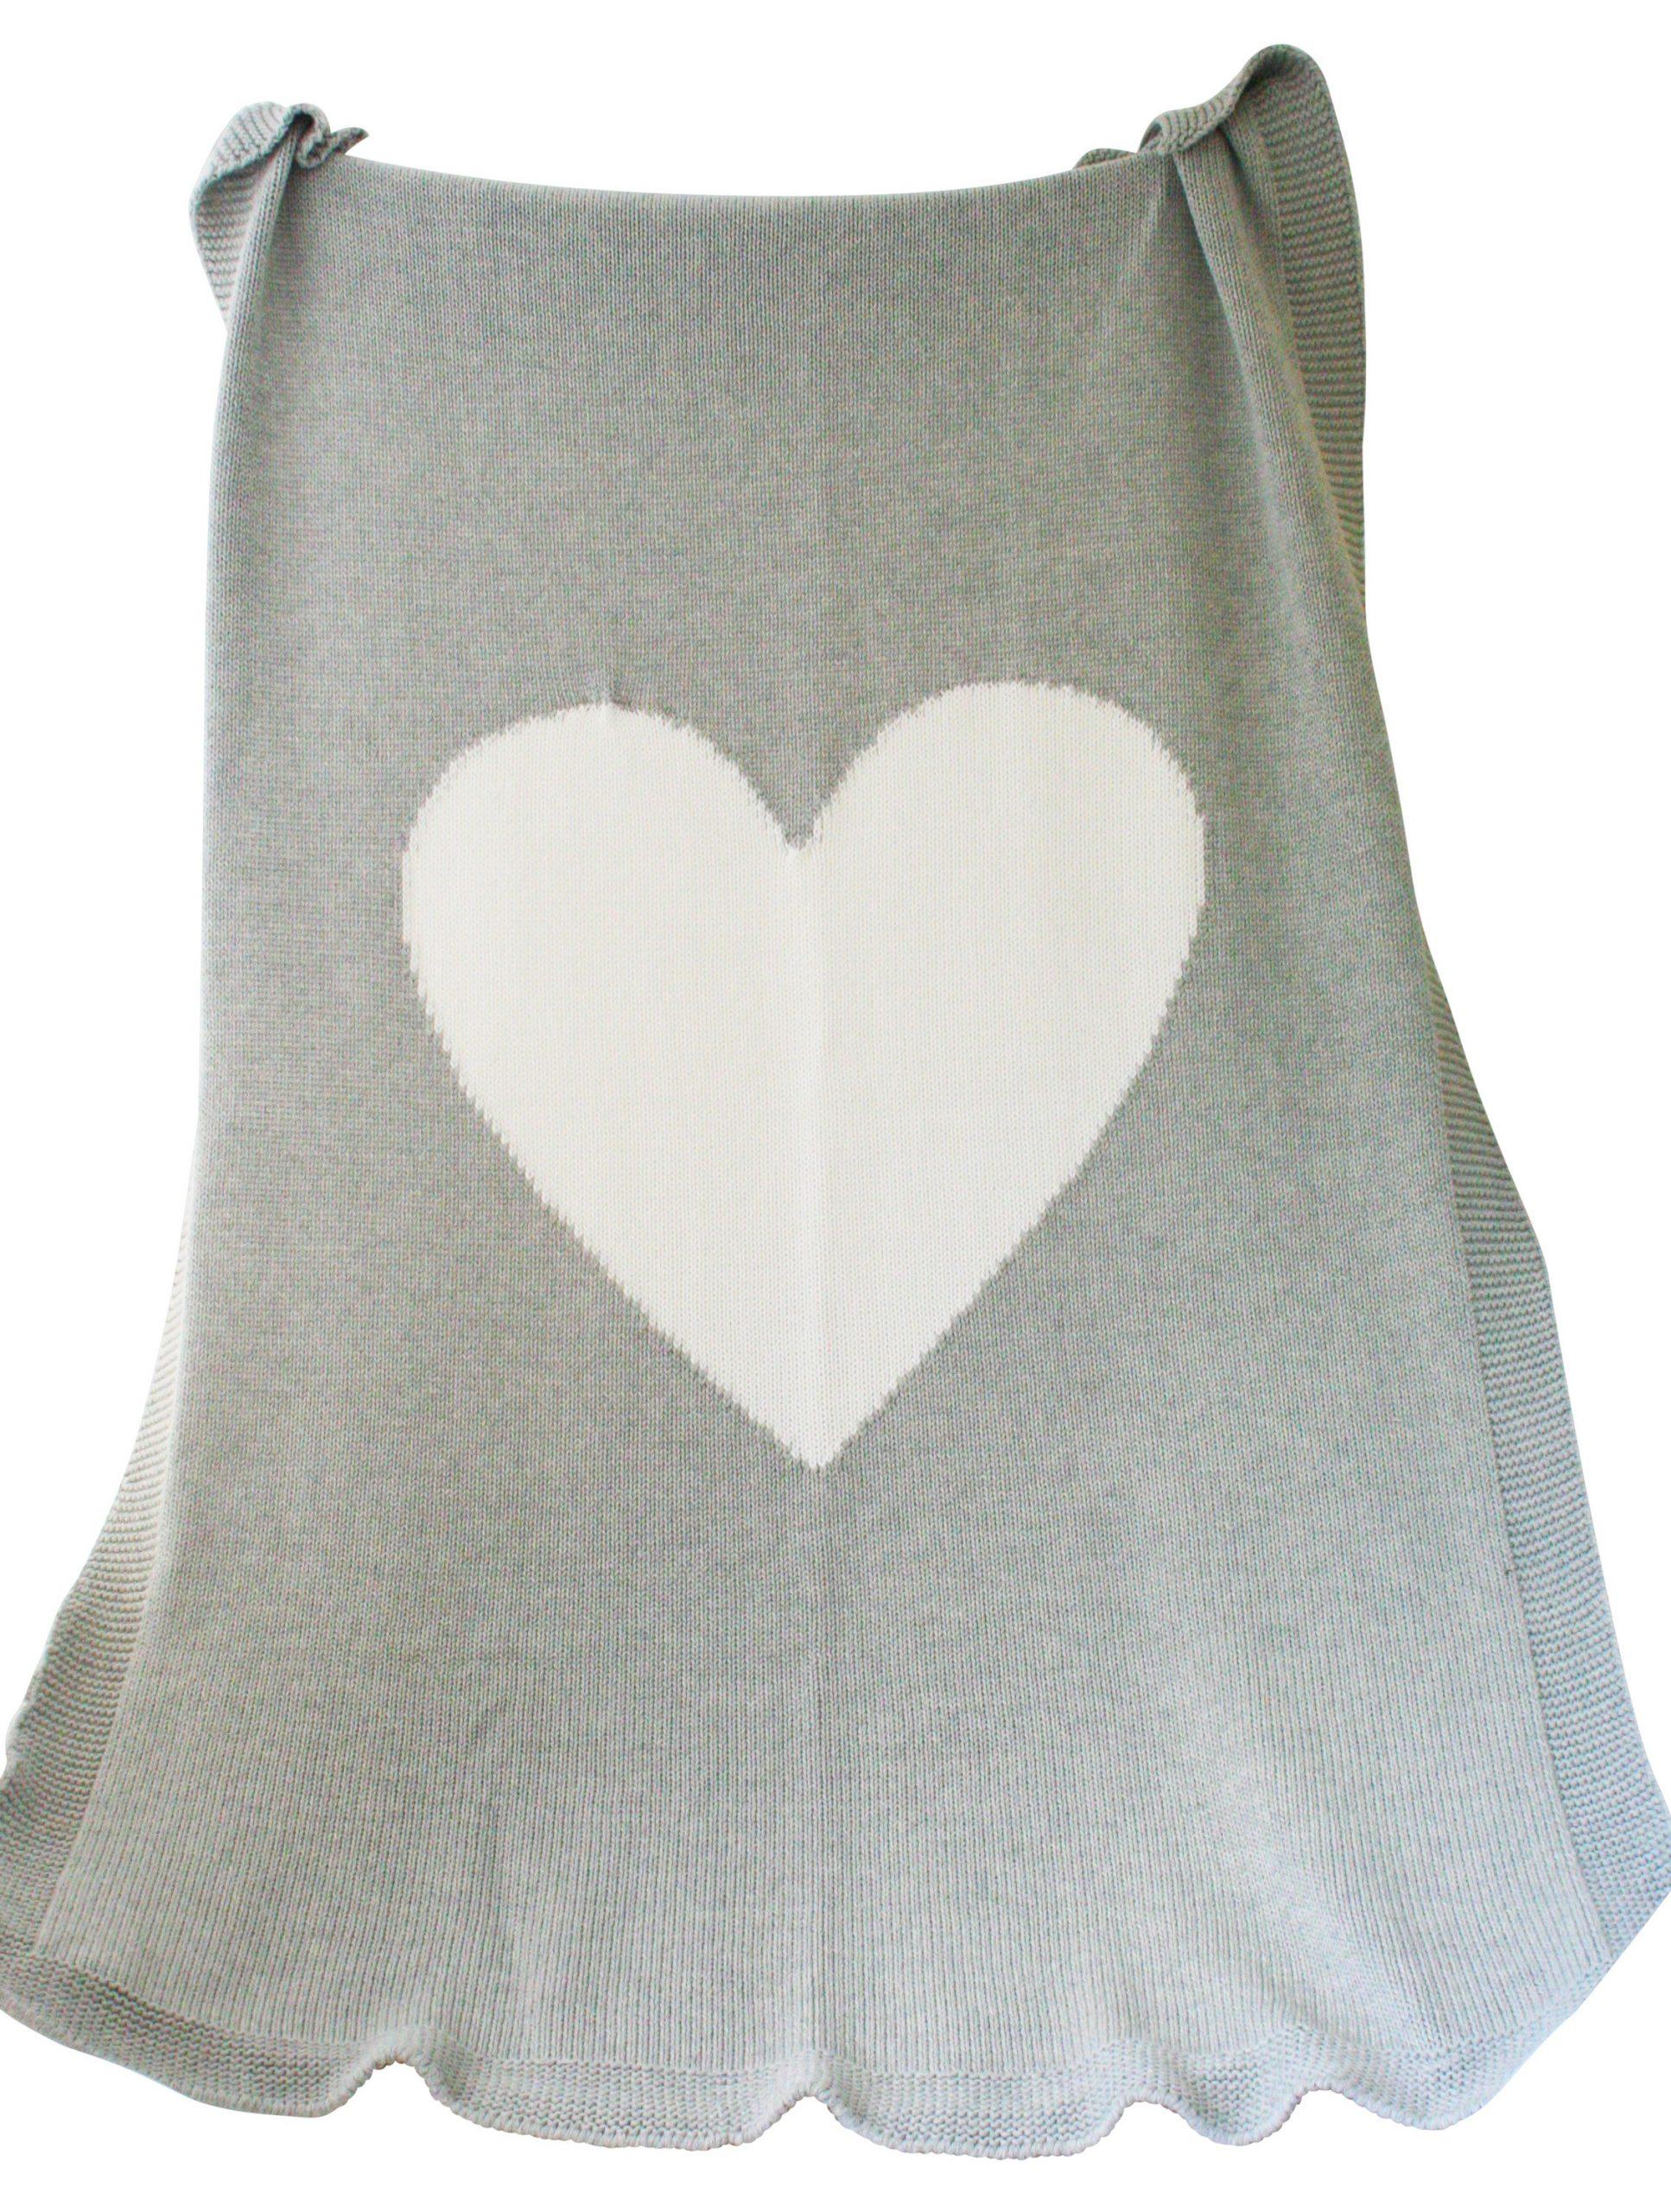 Alimrose Cotton Knit Heart Blanket - white /grey